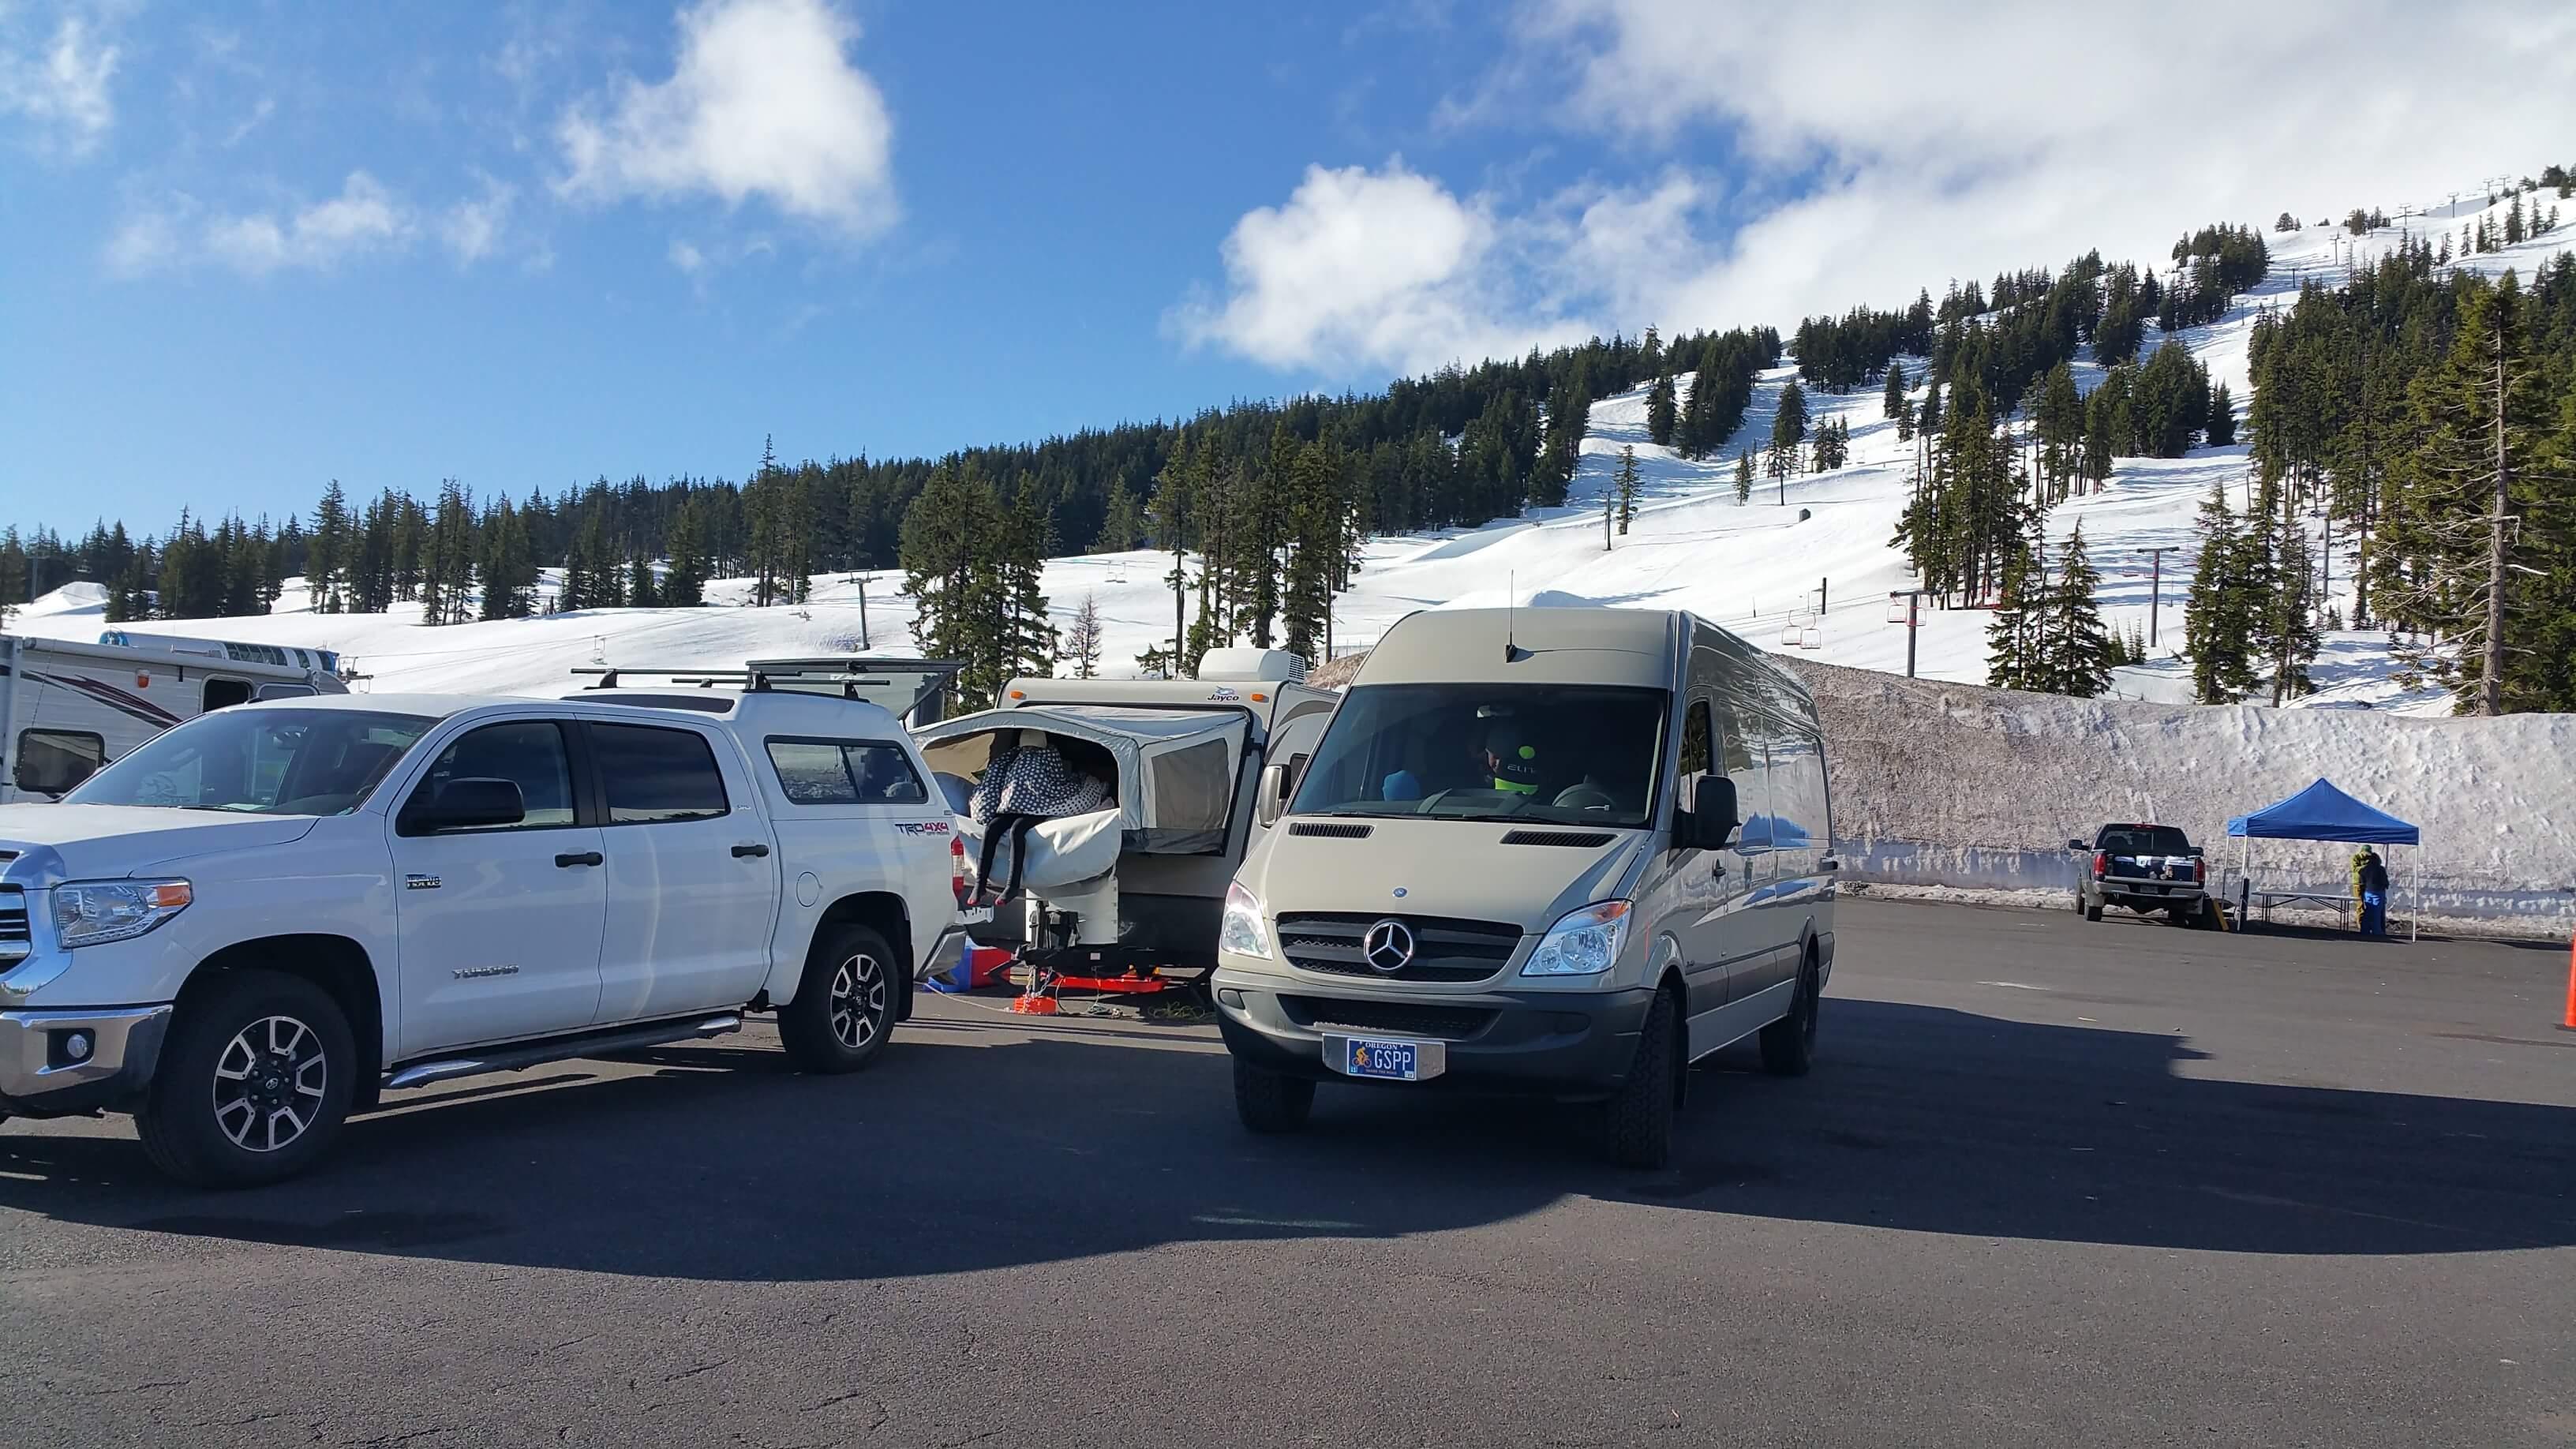 View Larger Image Sprinter Van Camping At Mt Bachelor